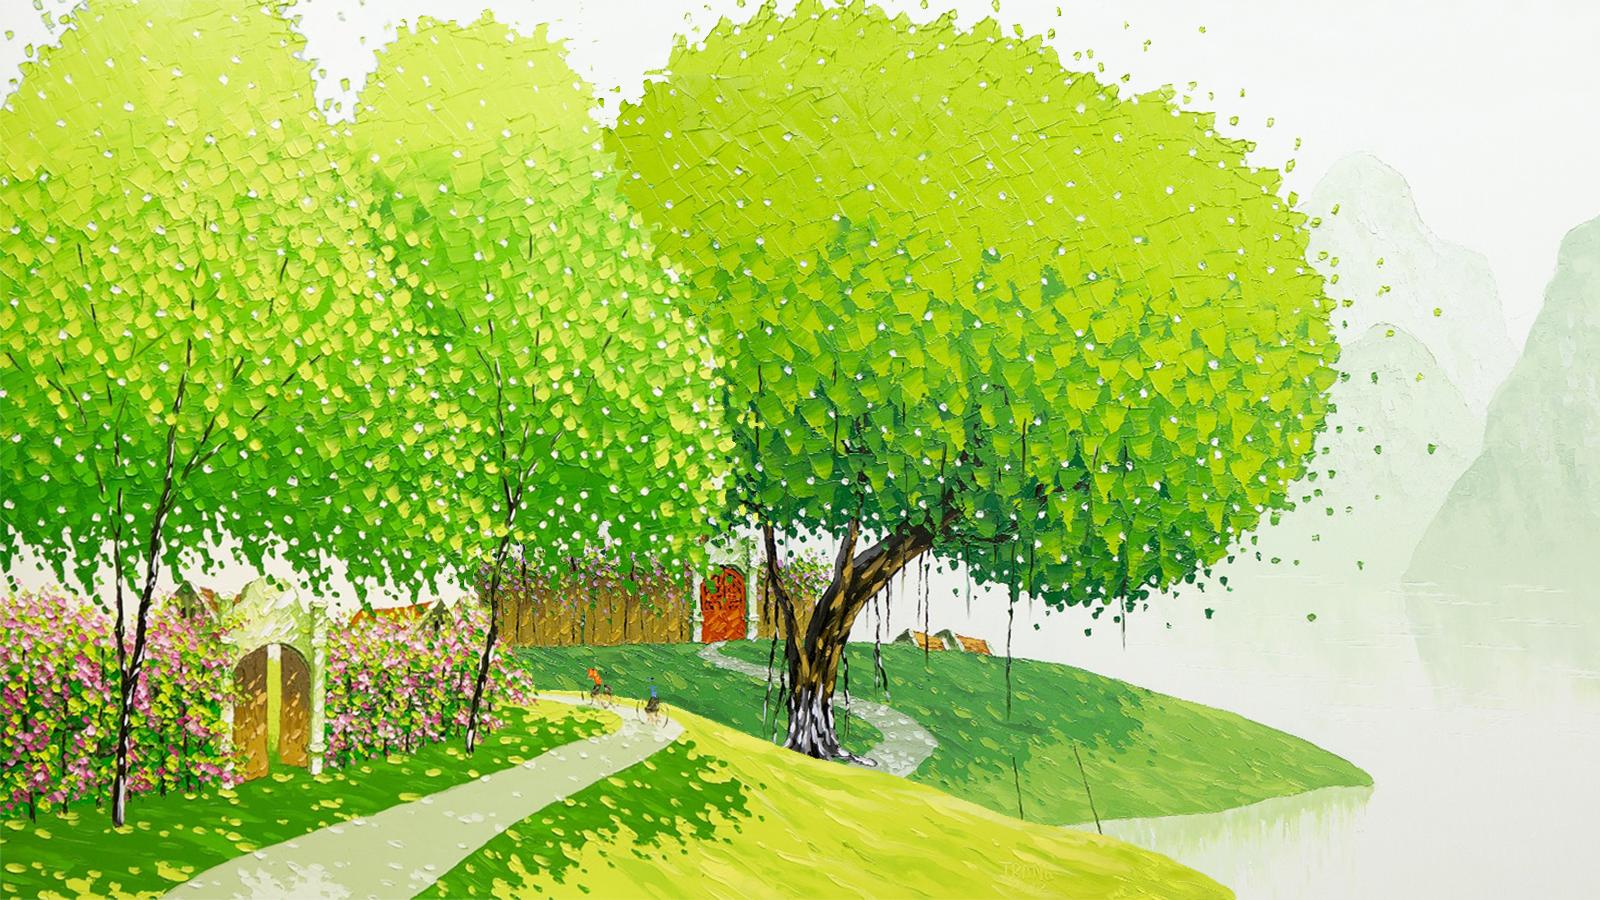 vietnam-landscapes-phan-thu-trang-07